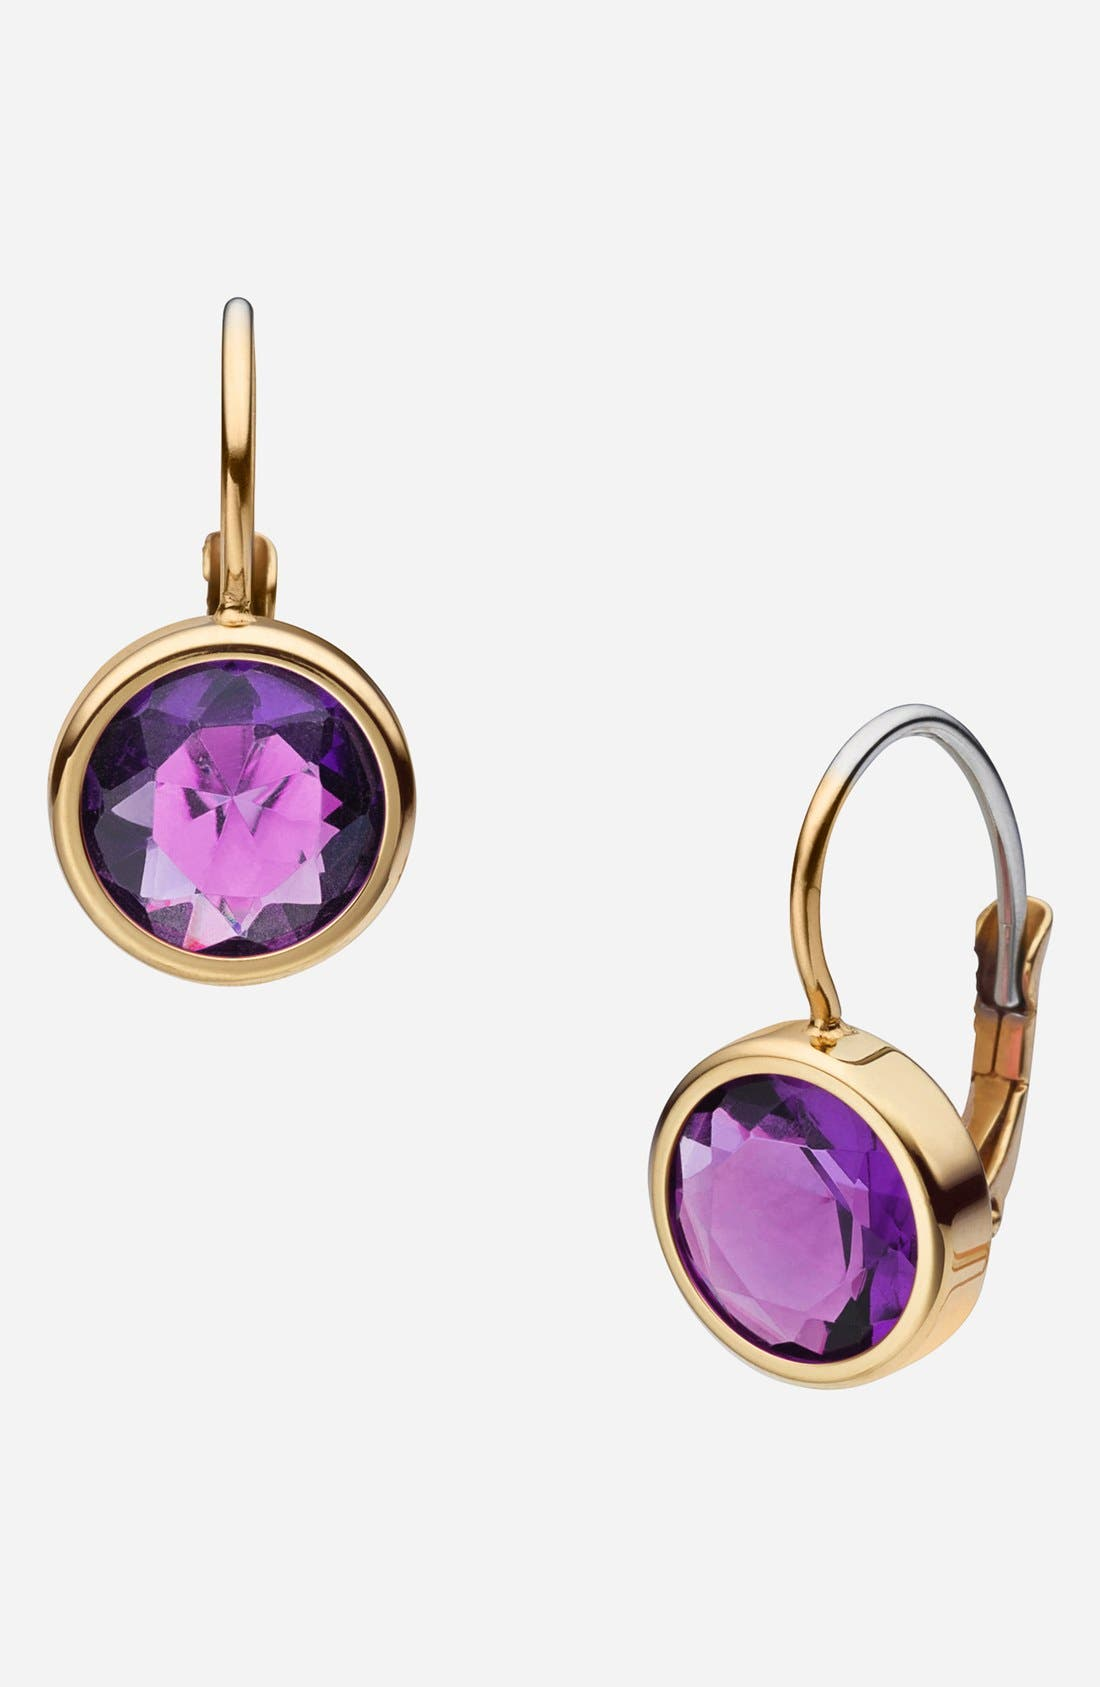 Main Image - Michael Kors 'Botanicals' Drop Earrings